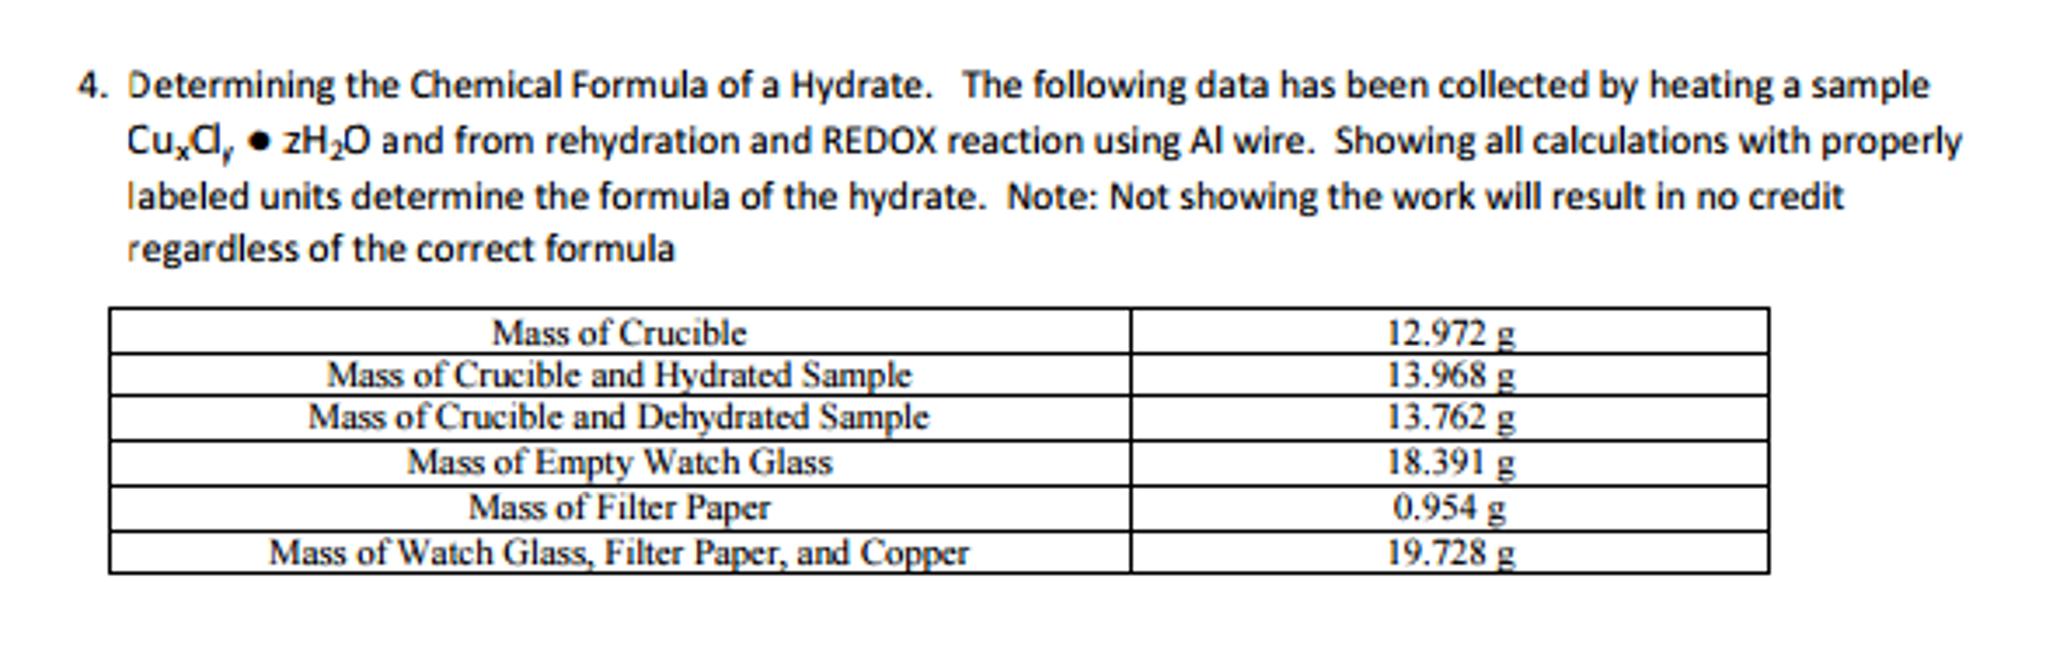 chem empirical formula of a hydrate